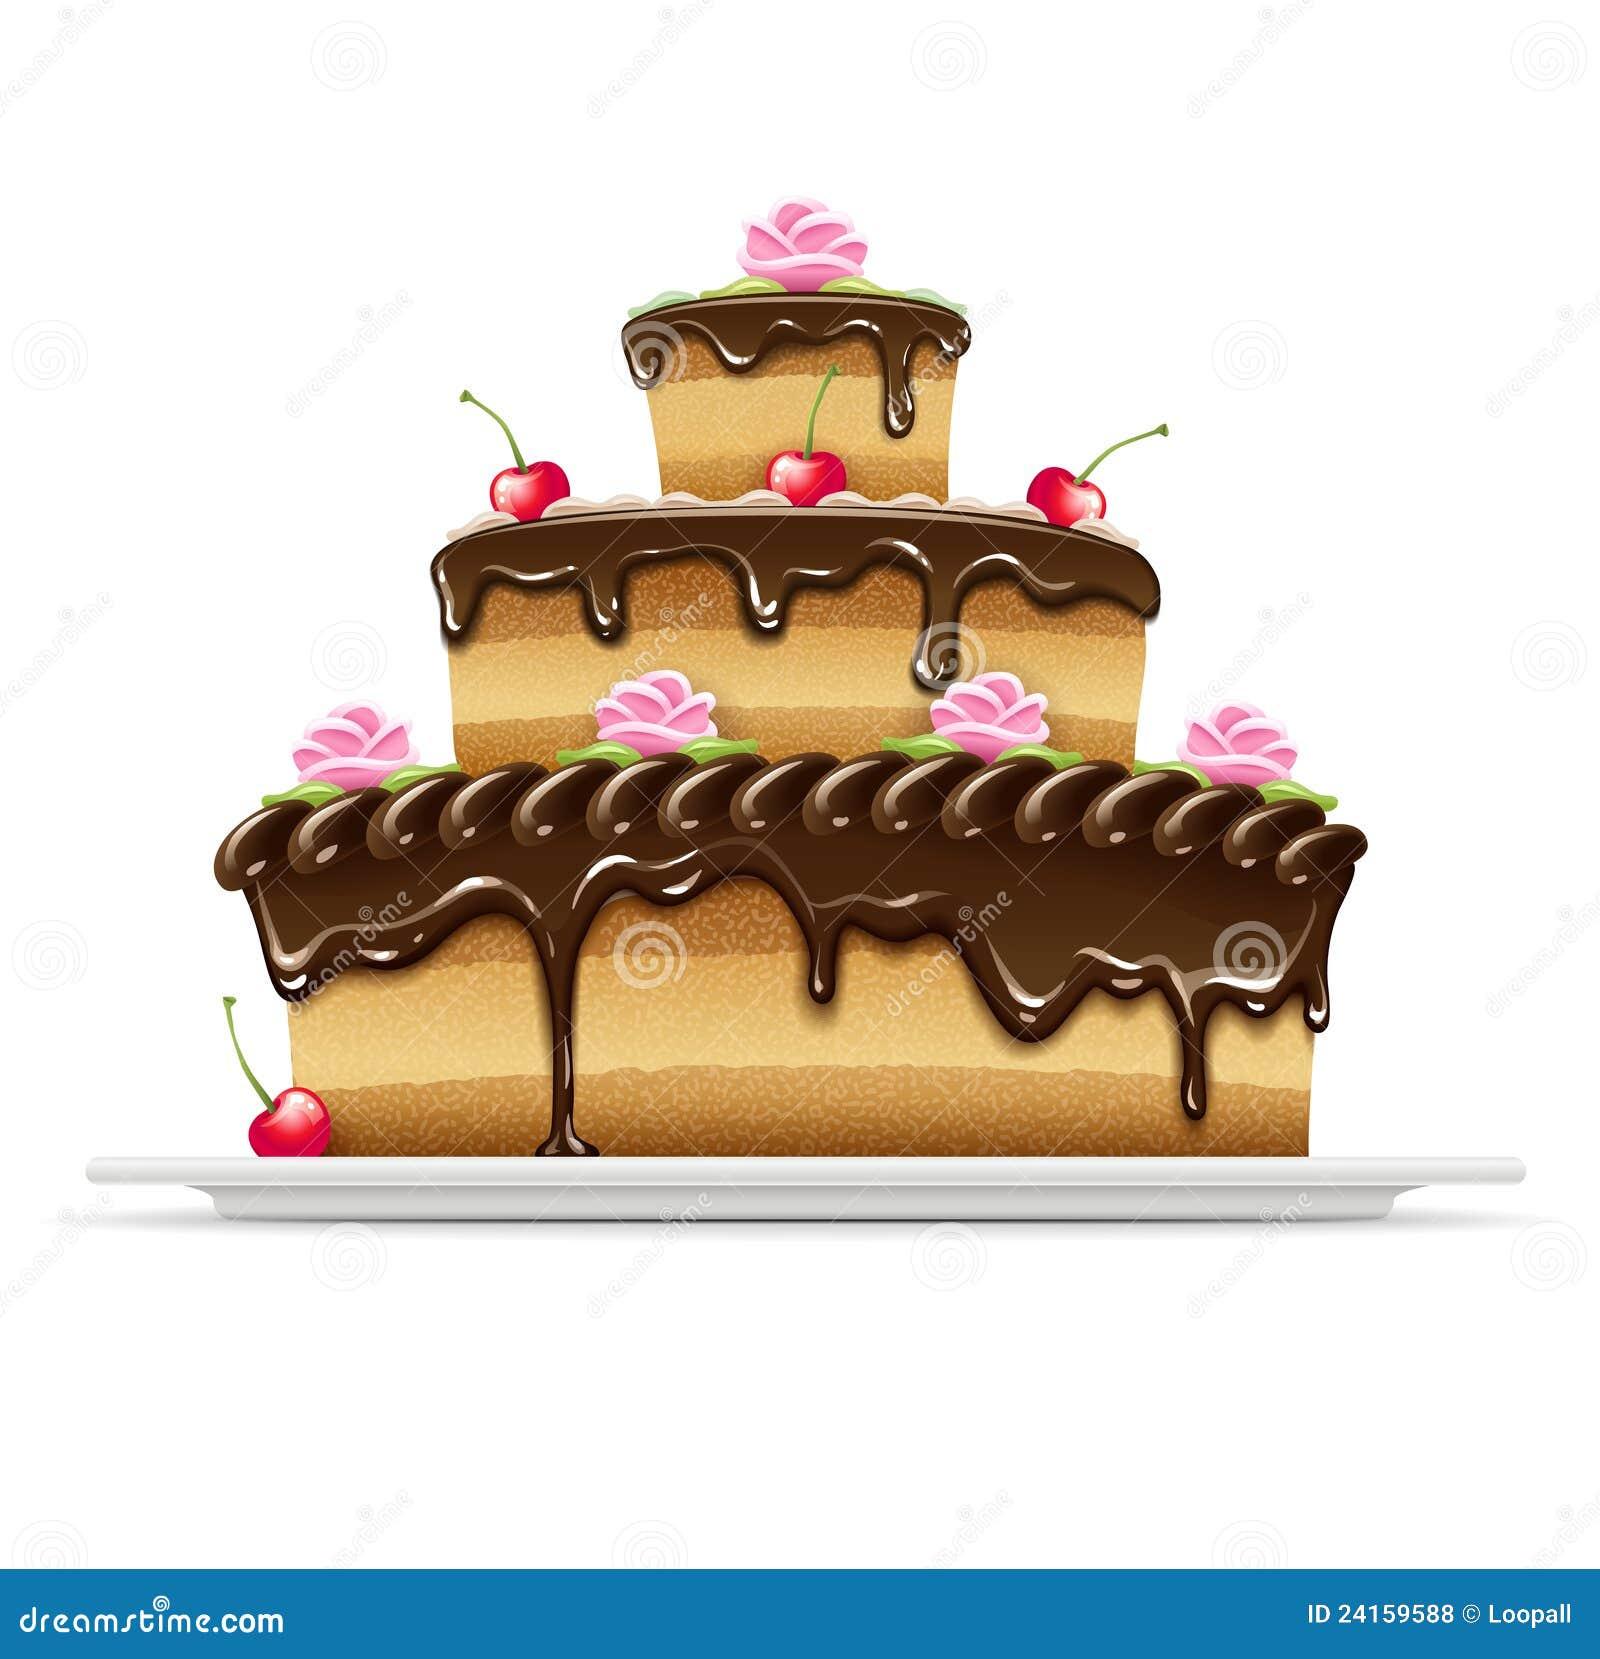 Sweet Chocolate Cake For Birthday Royalty Free Stock